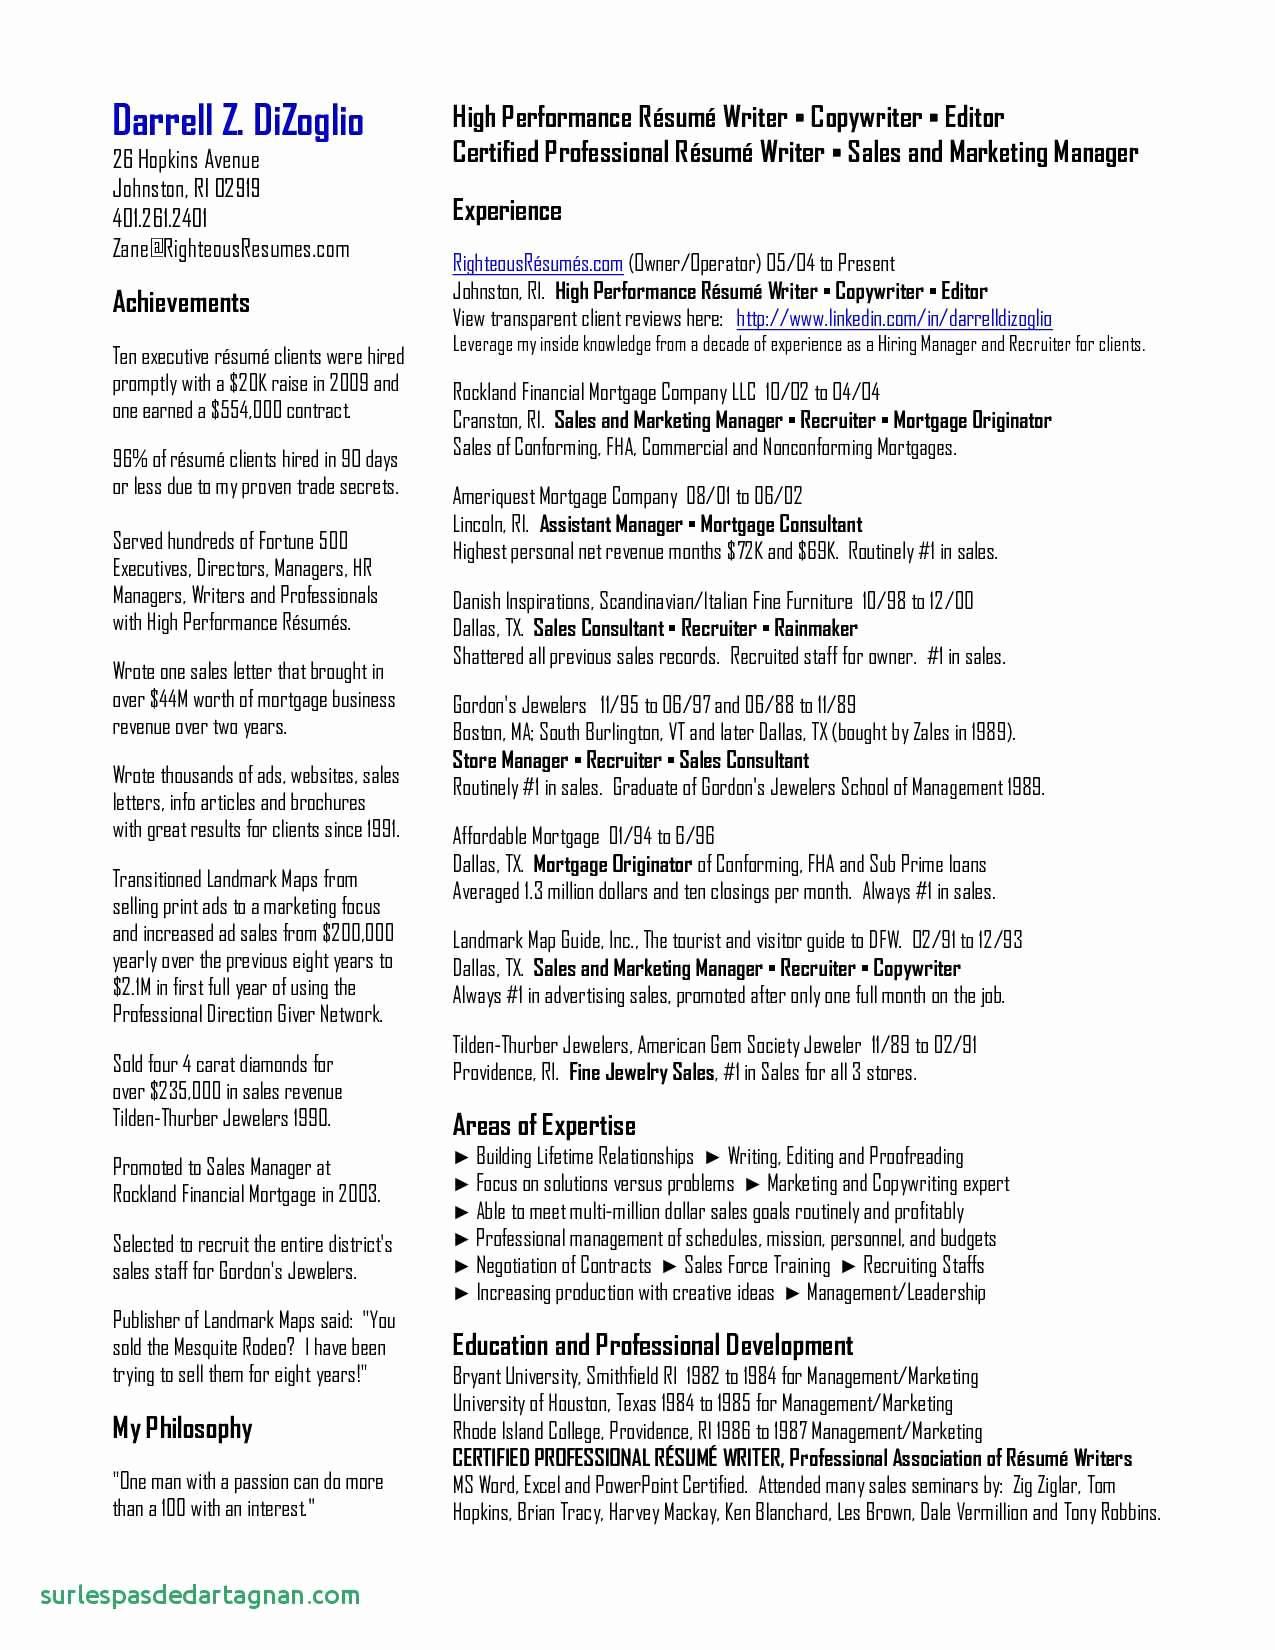 Letter to Santa Template Free Printable - Elegant Letter From Santa Template Word